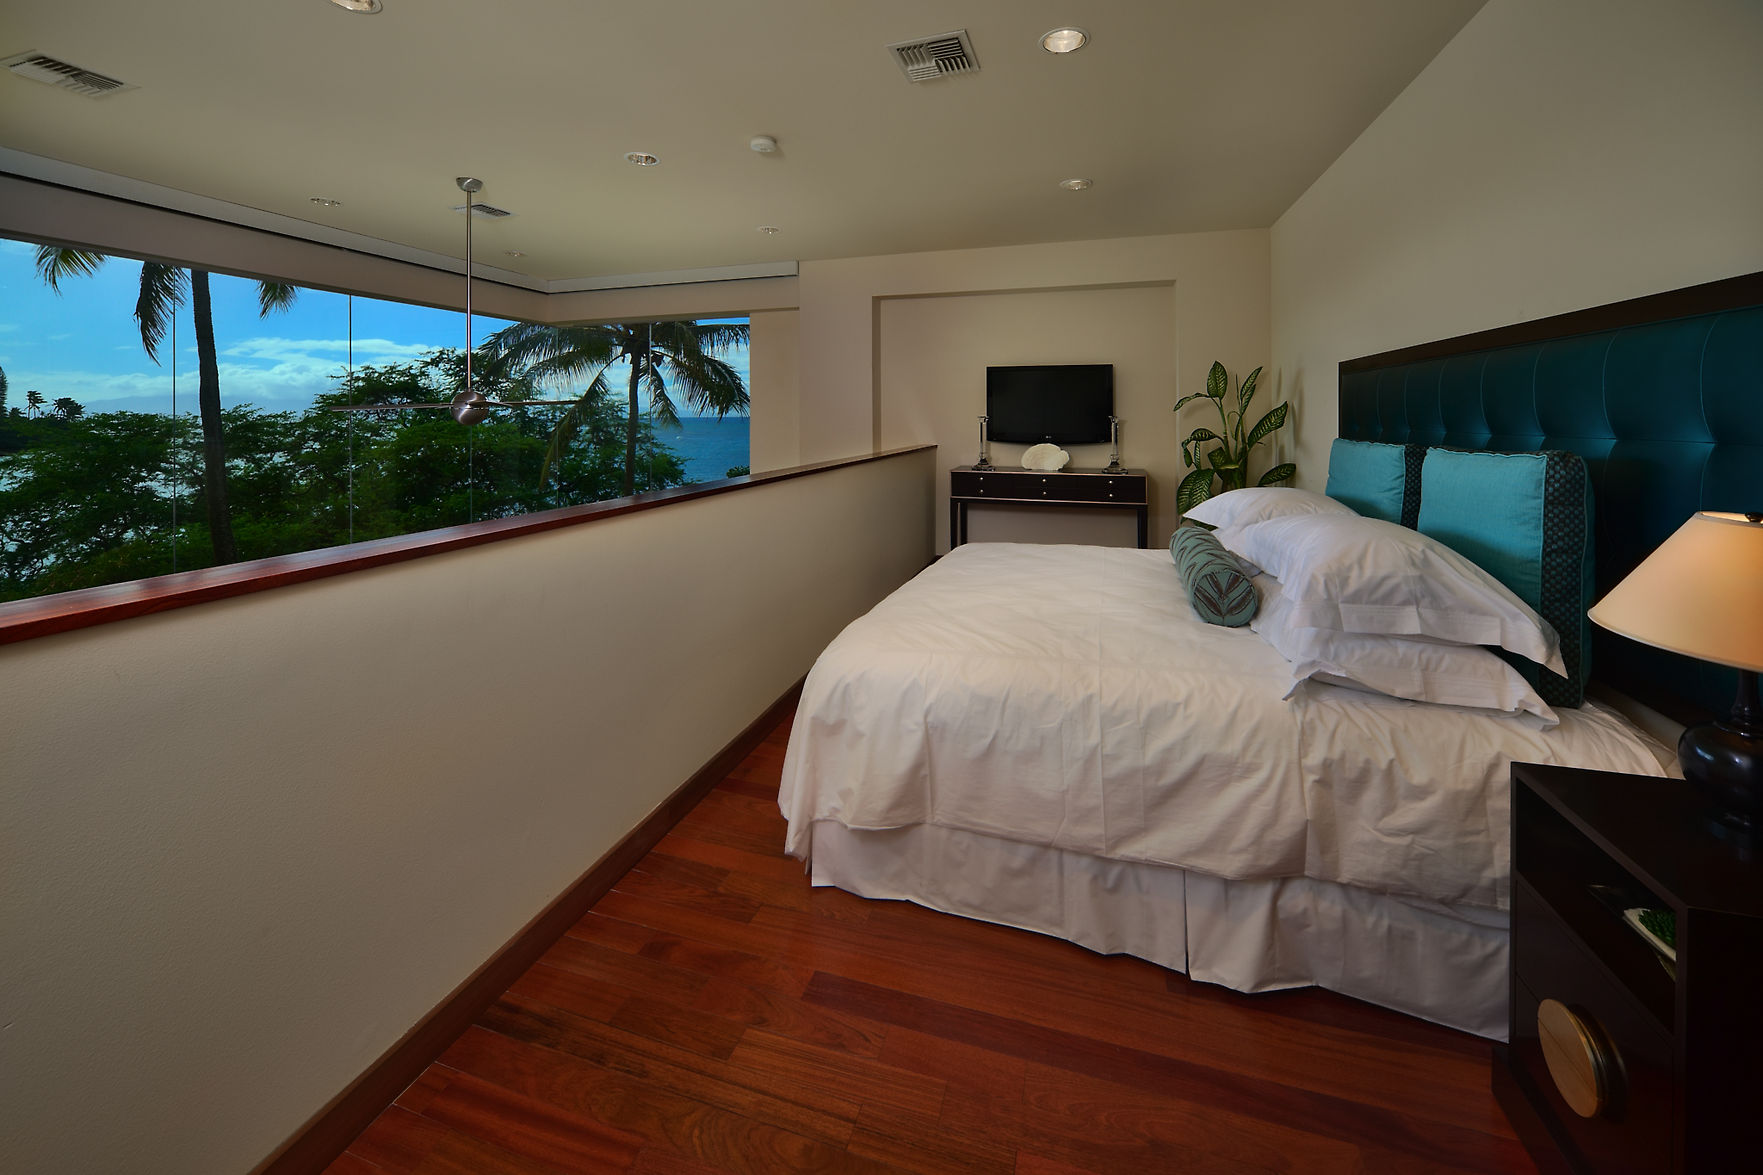 Hawaiian Style Bedroom: Stunning New Luxury Residence In Hawaii By Arri Lecron